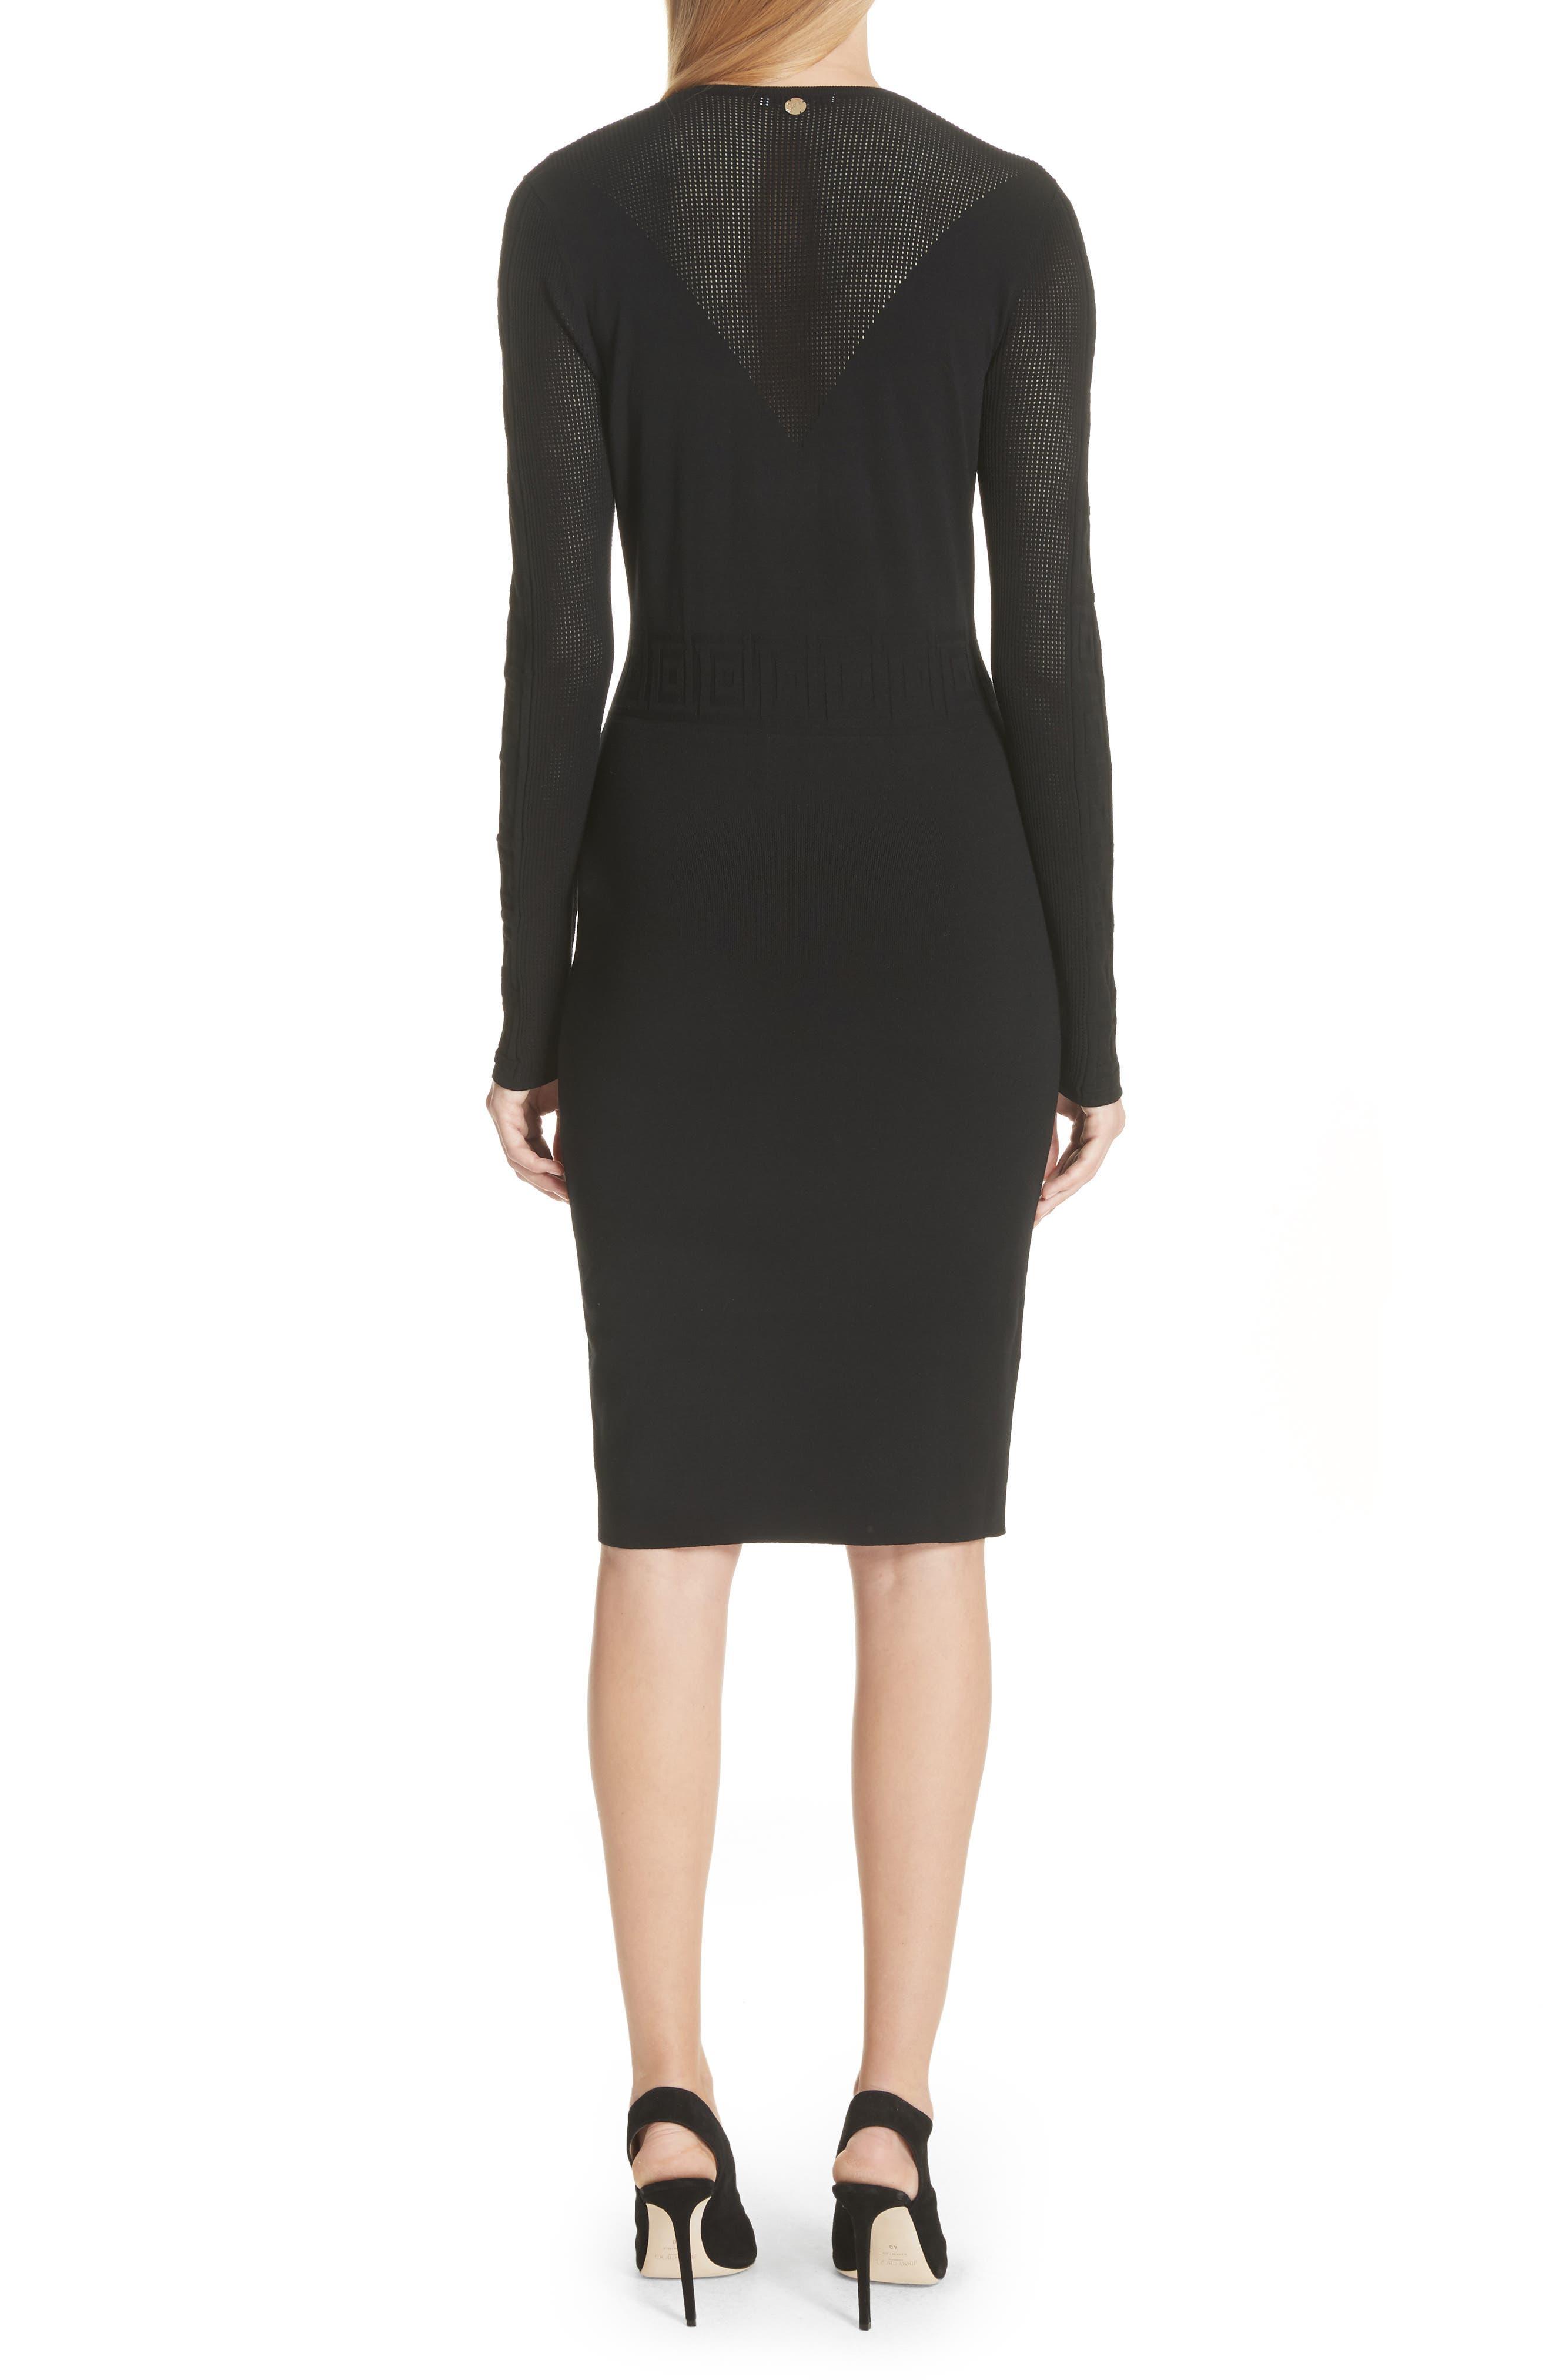 Sheer Detail Knit Dress,                             Alternate thumbnail 2, color,                             Black